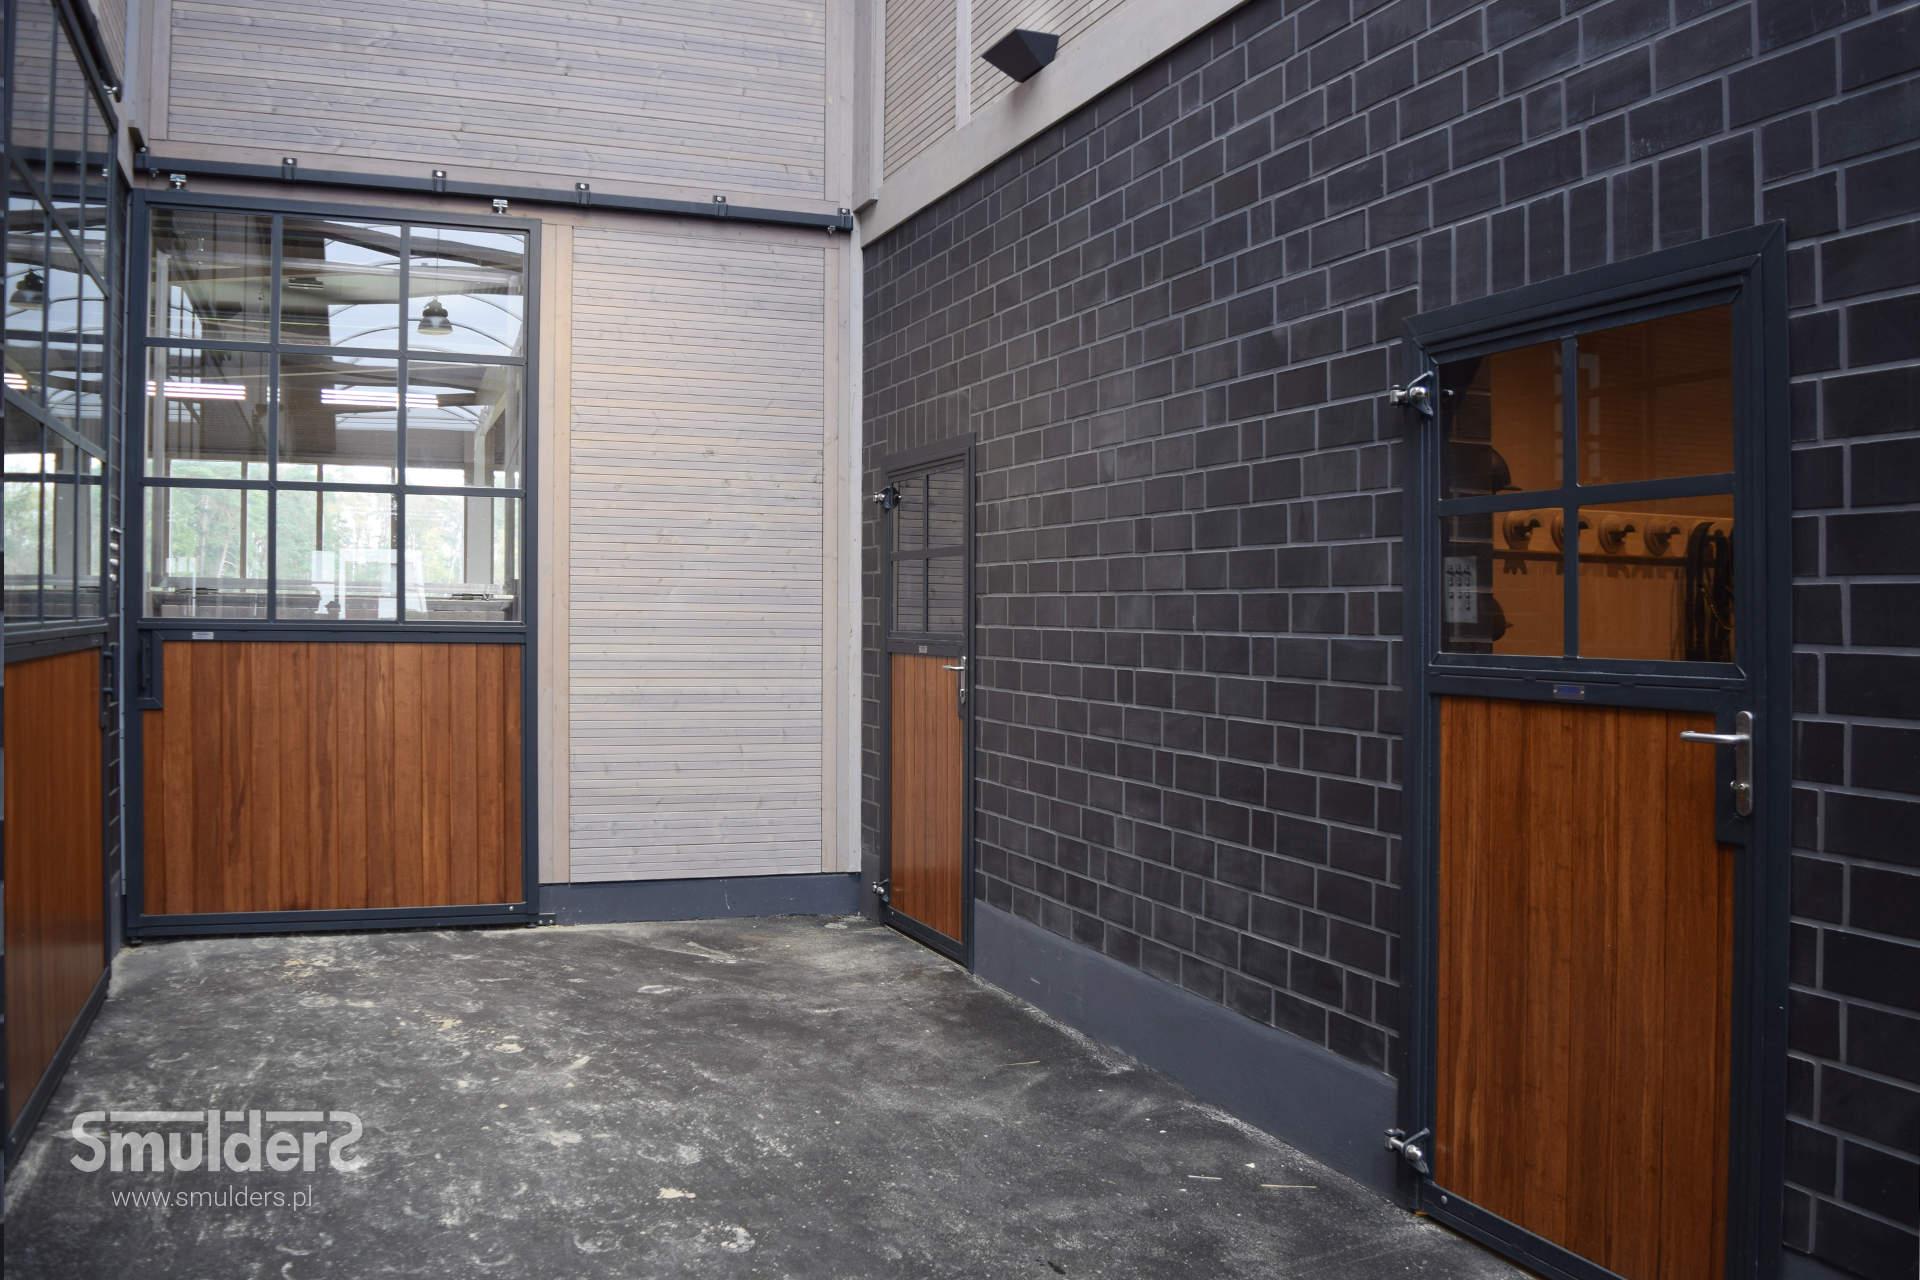 http://www.smulders.pl/wp-content/uploads/2019/06/f004_barn-doors_doors_IMM_SMULDERS_PL.jpg